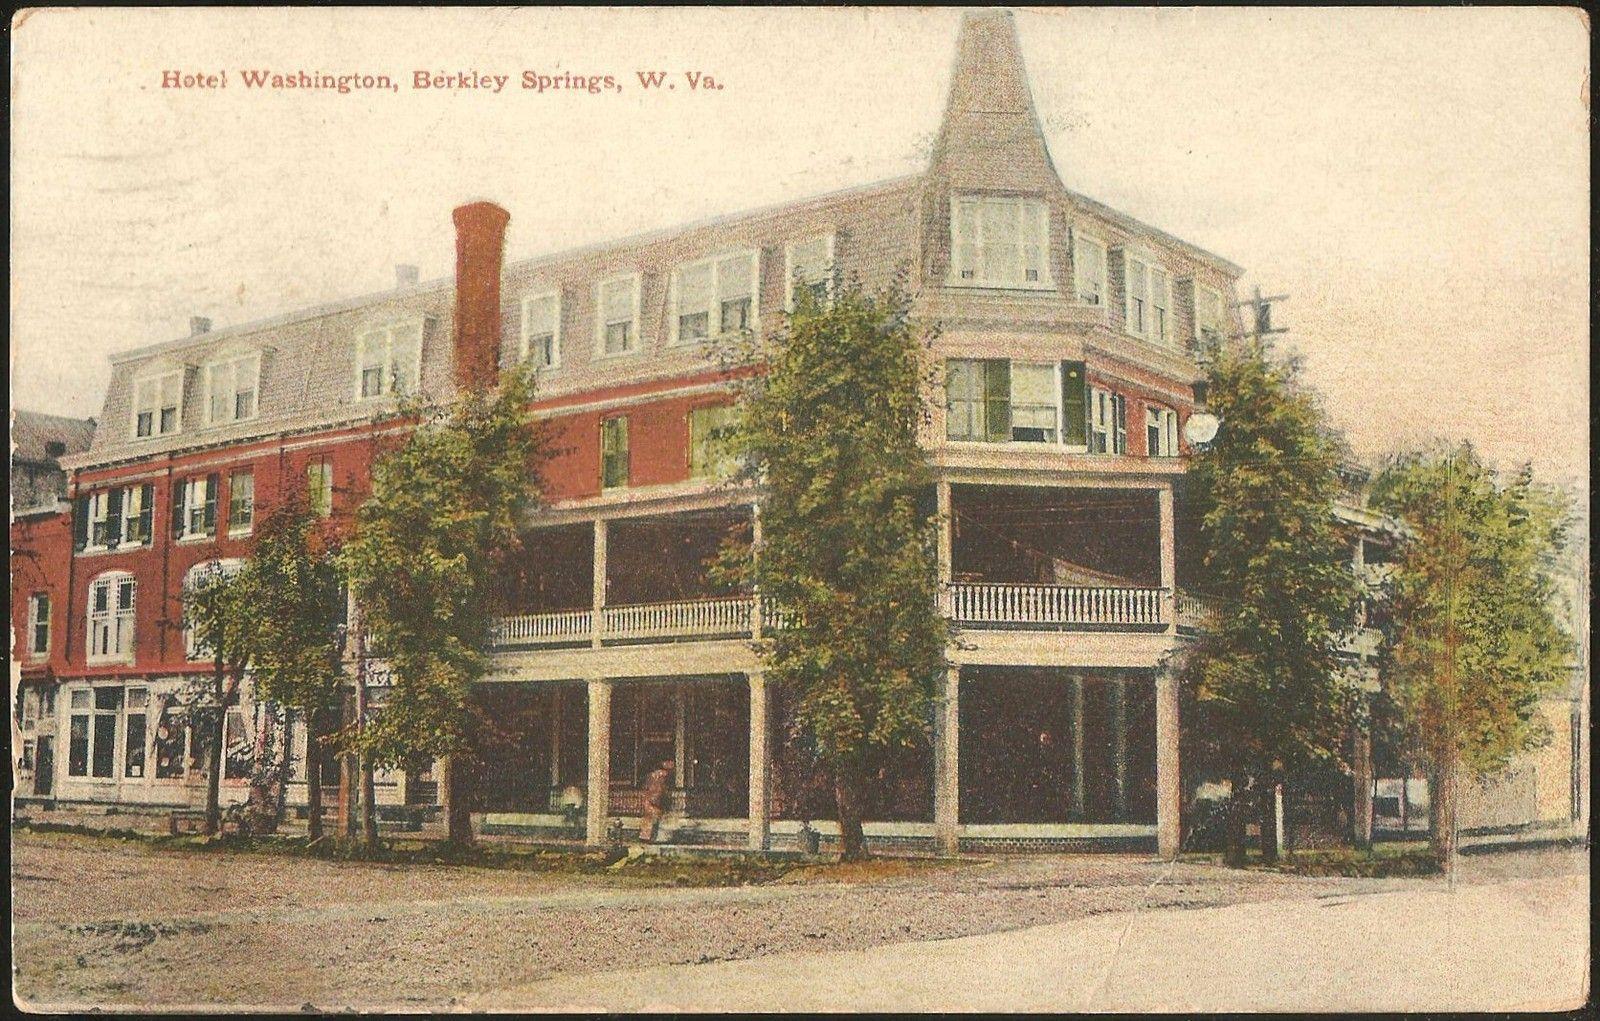 Berland Md To Parkersburg Wv Hotel Washington Berkeley Springs Postcard Postmarked